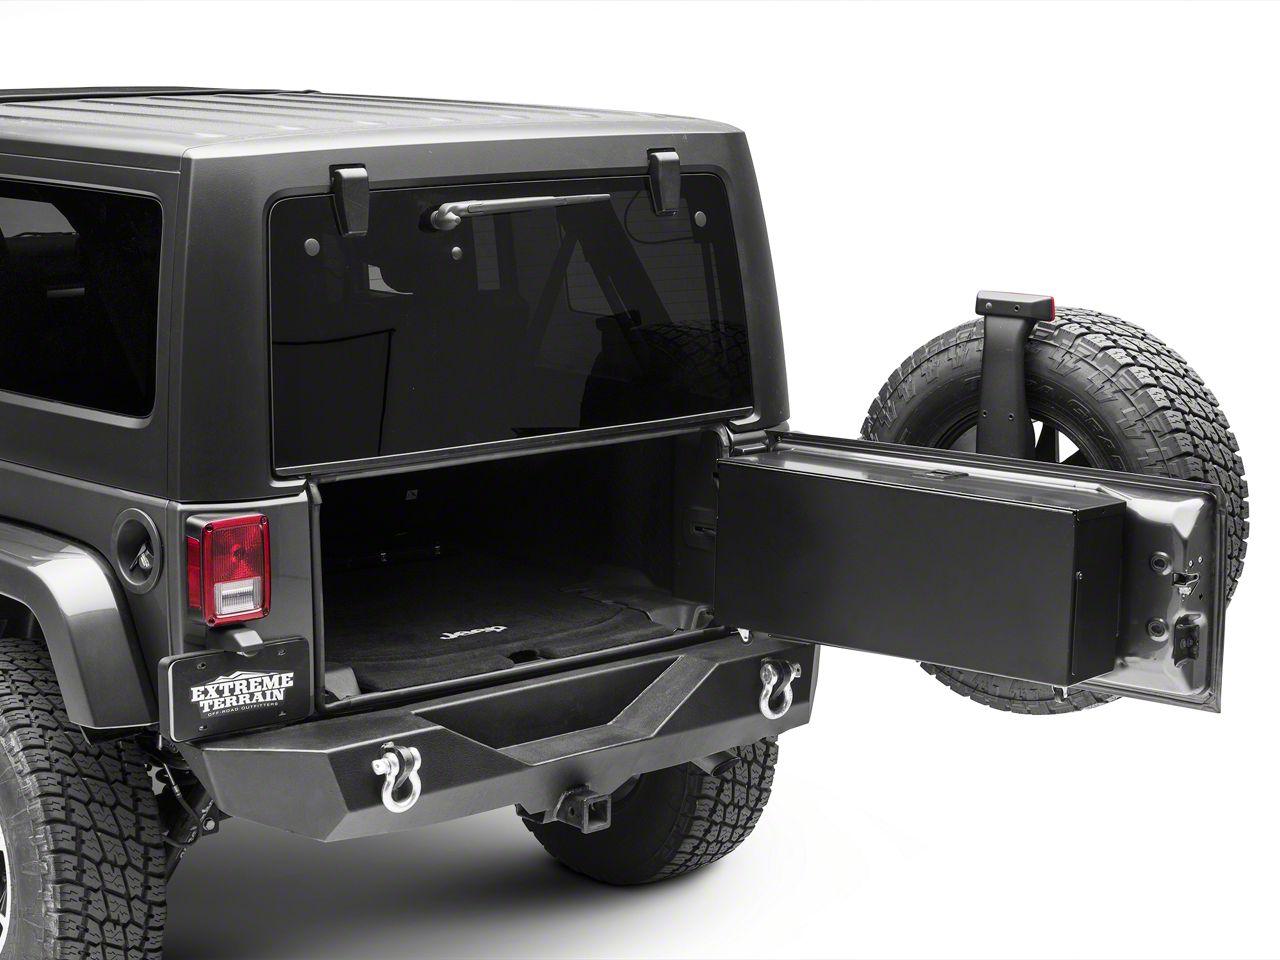 Carrichs Tailgate Storage Box - Gloss Black (07-18 Jeep Wrangler JK w/o Rear Side Mounted Subwoofer)